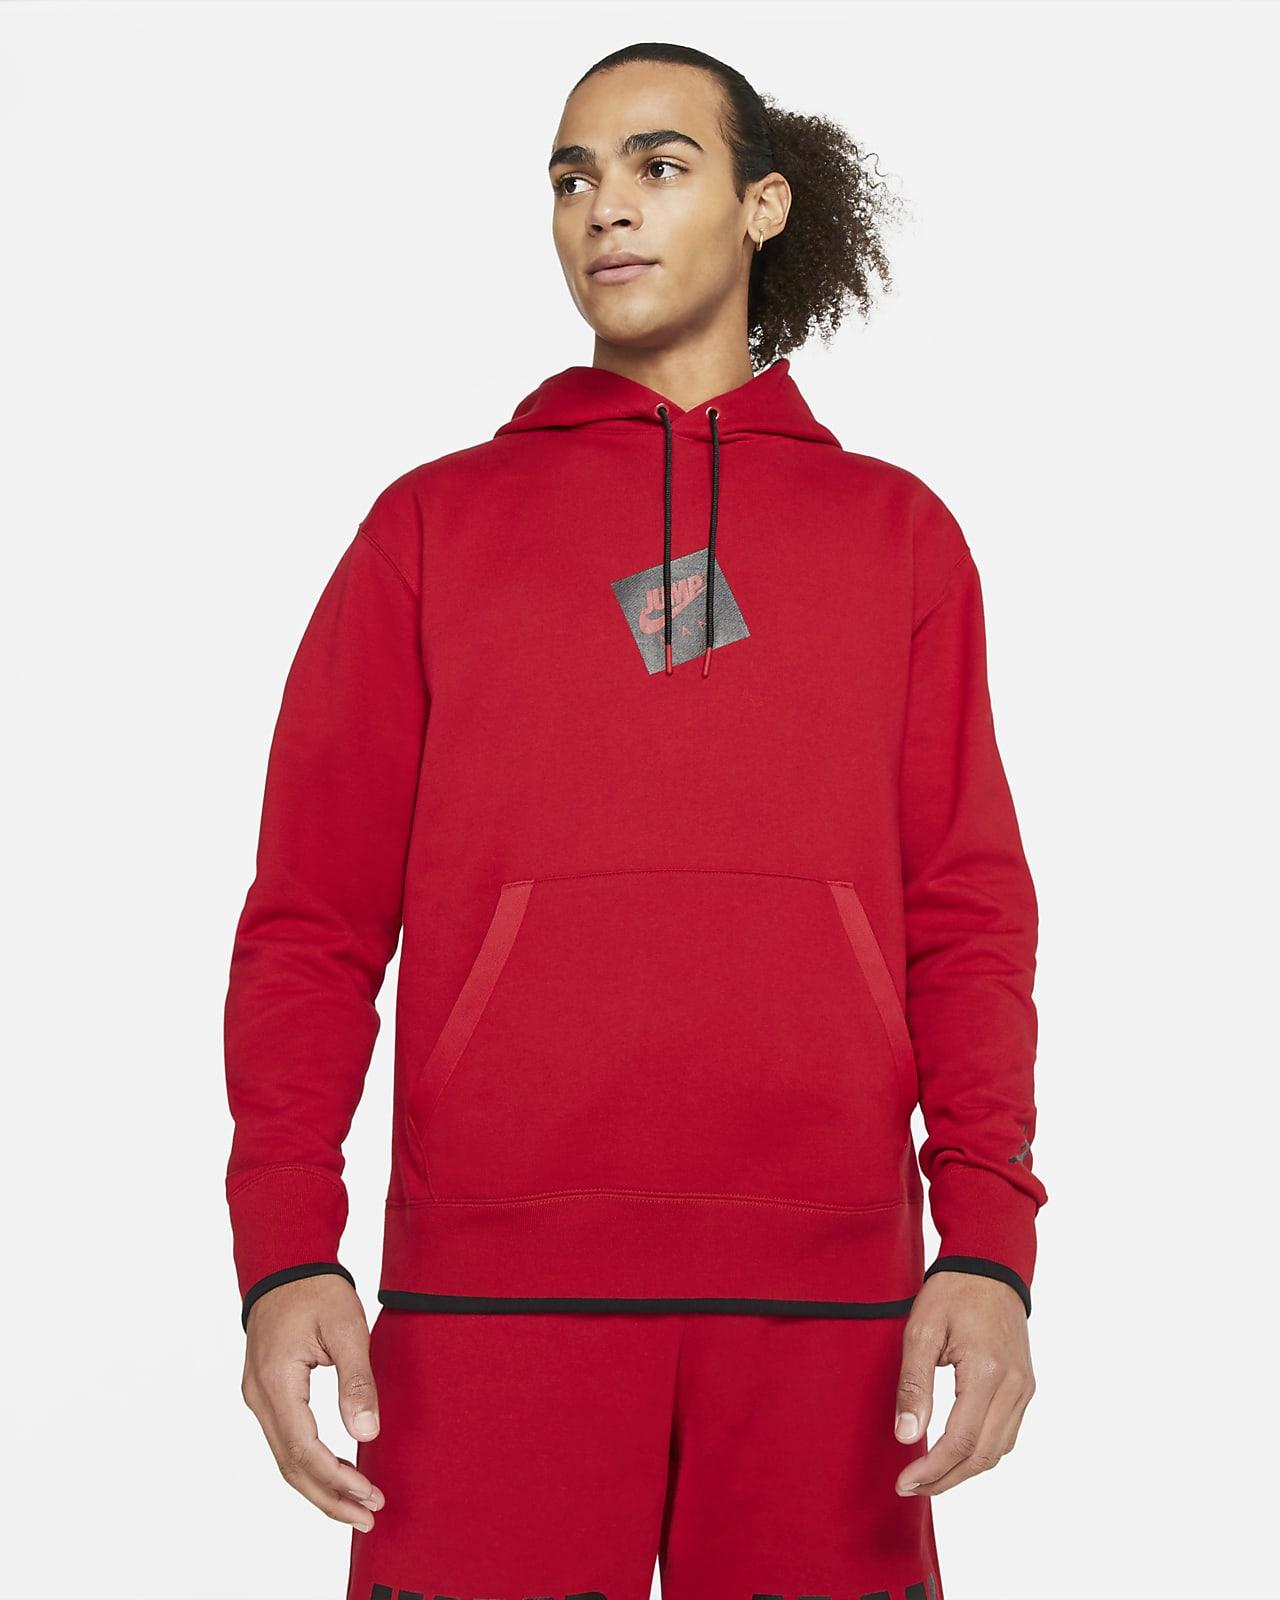 Jordan Jumpman Classics Men's Printed Fleece Pullover Hoodie